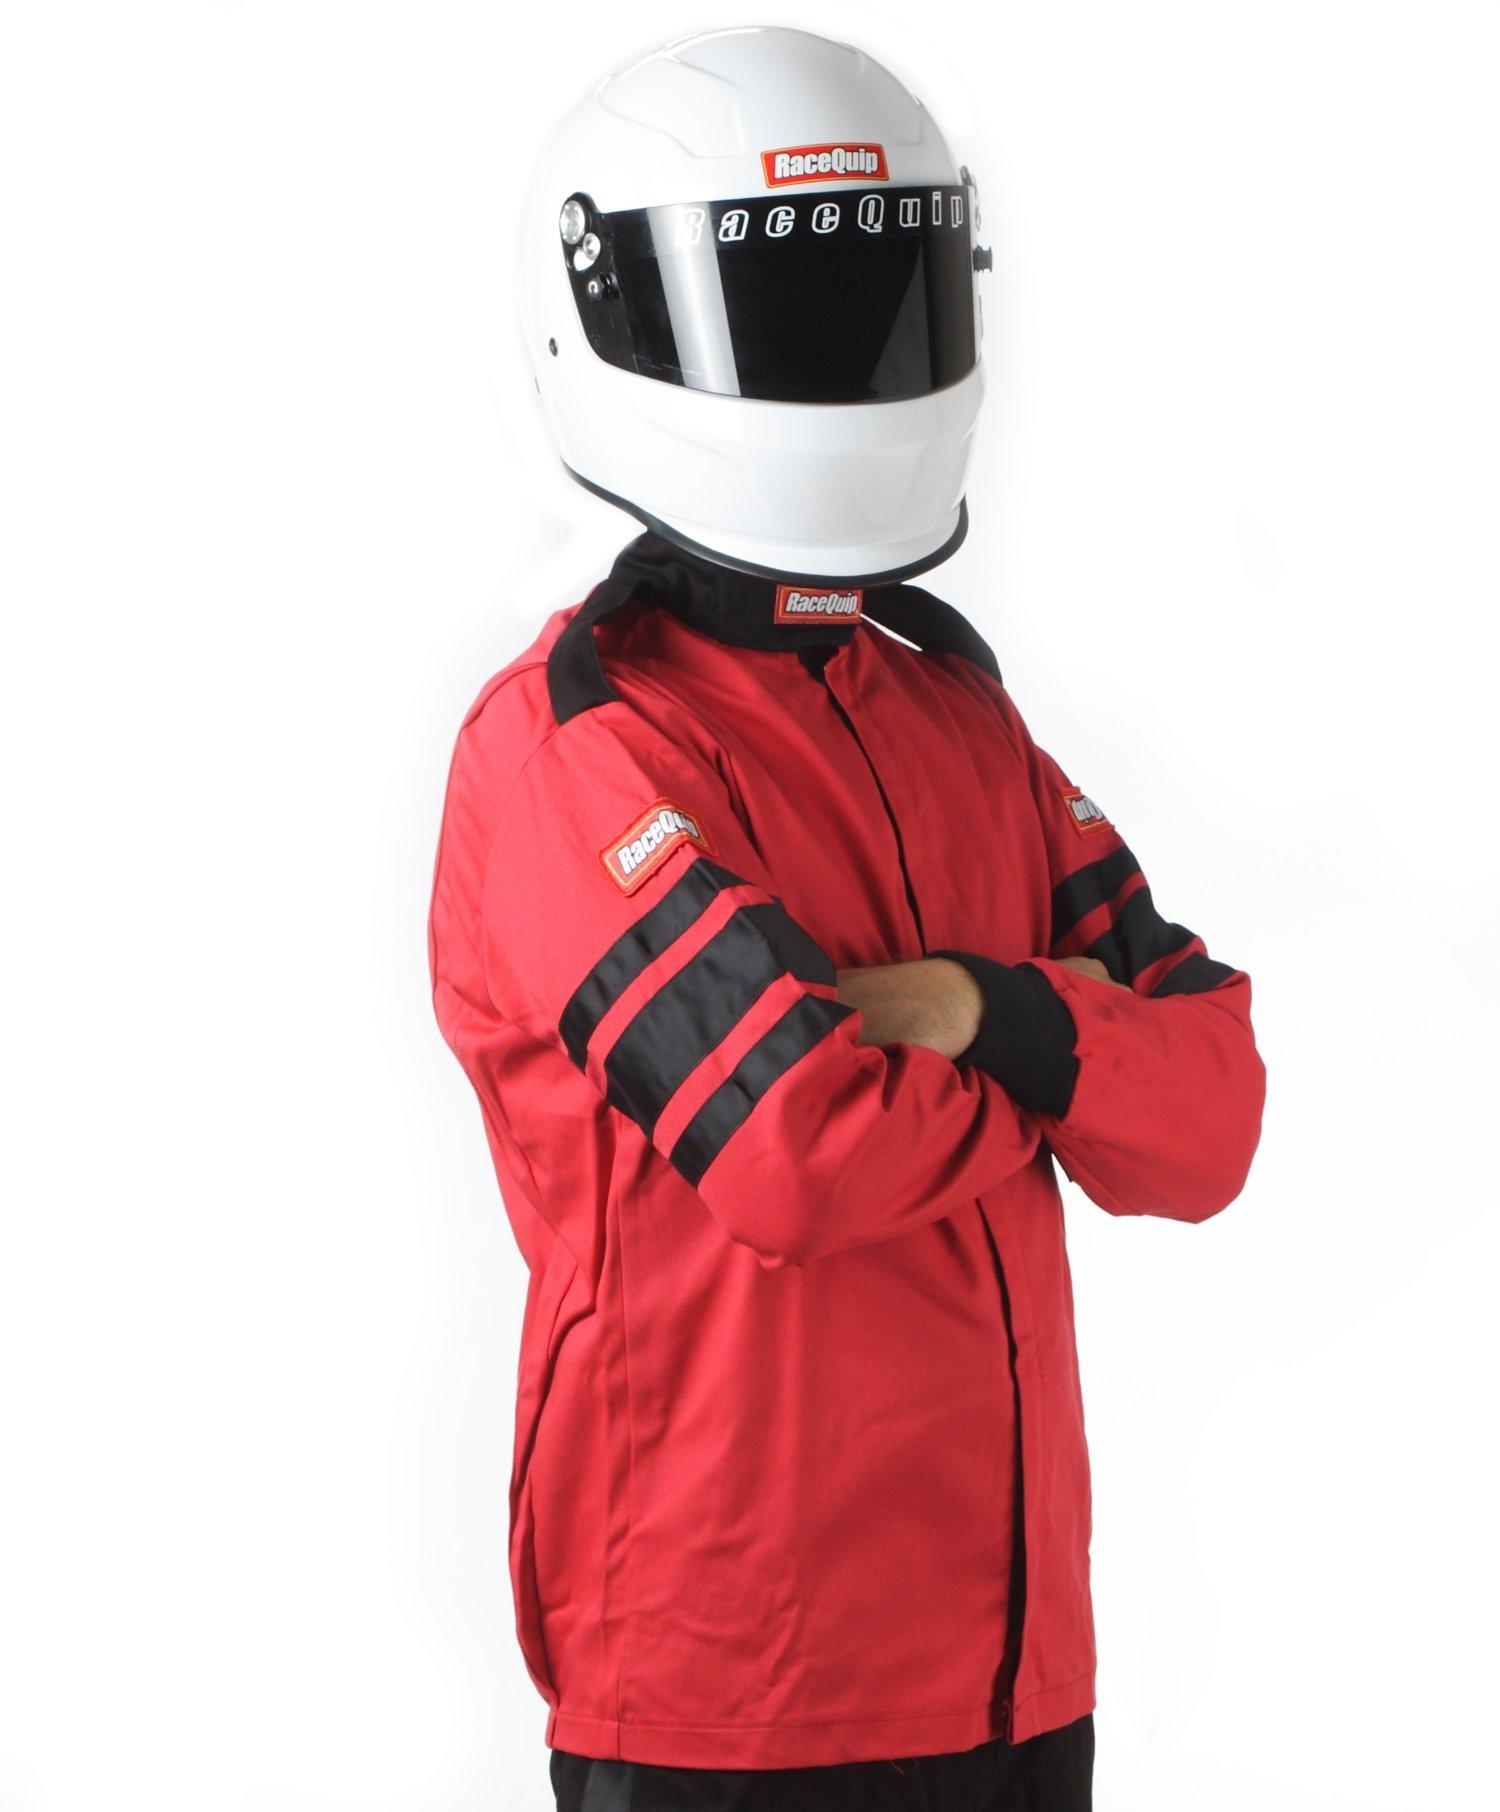 RaceQuip 111013 111 Series Medium Red SFI 3.2A/1 Single Layer Driving Jacket